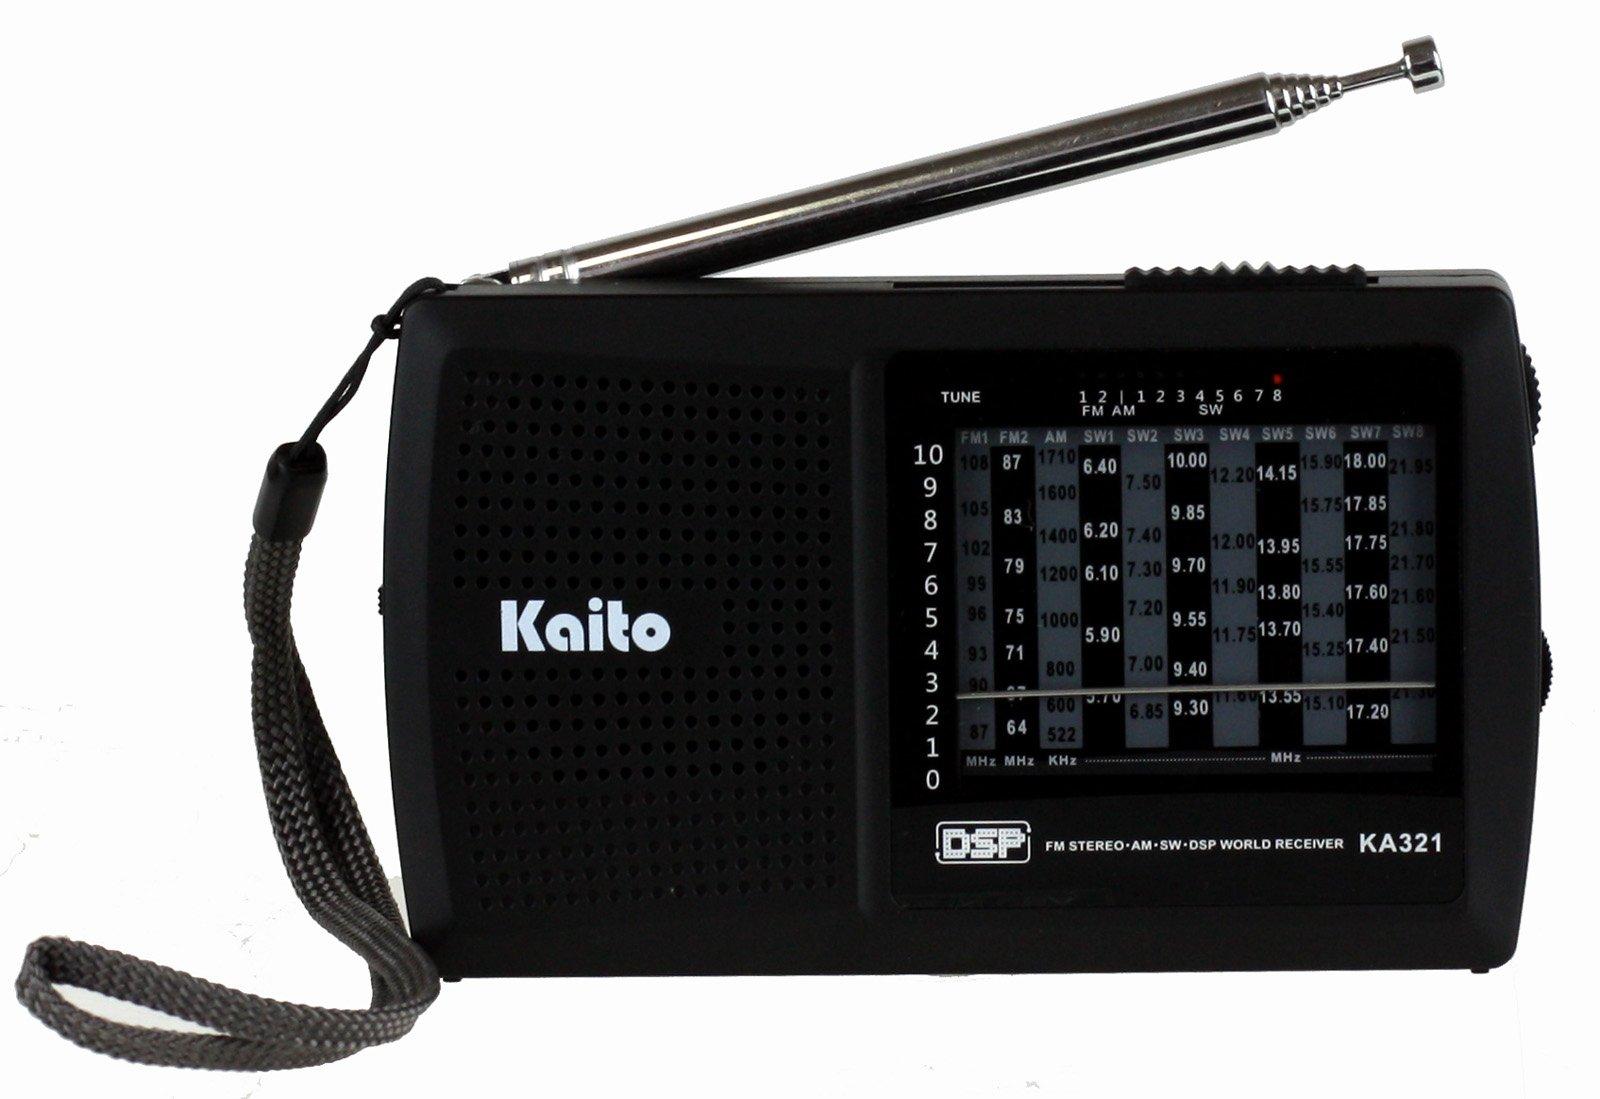 Kaito KA321 Pocket-Size 10-Band AM/FM Shortwave Radio with DSP (Digital Signal Processing), Black